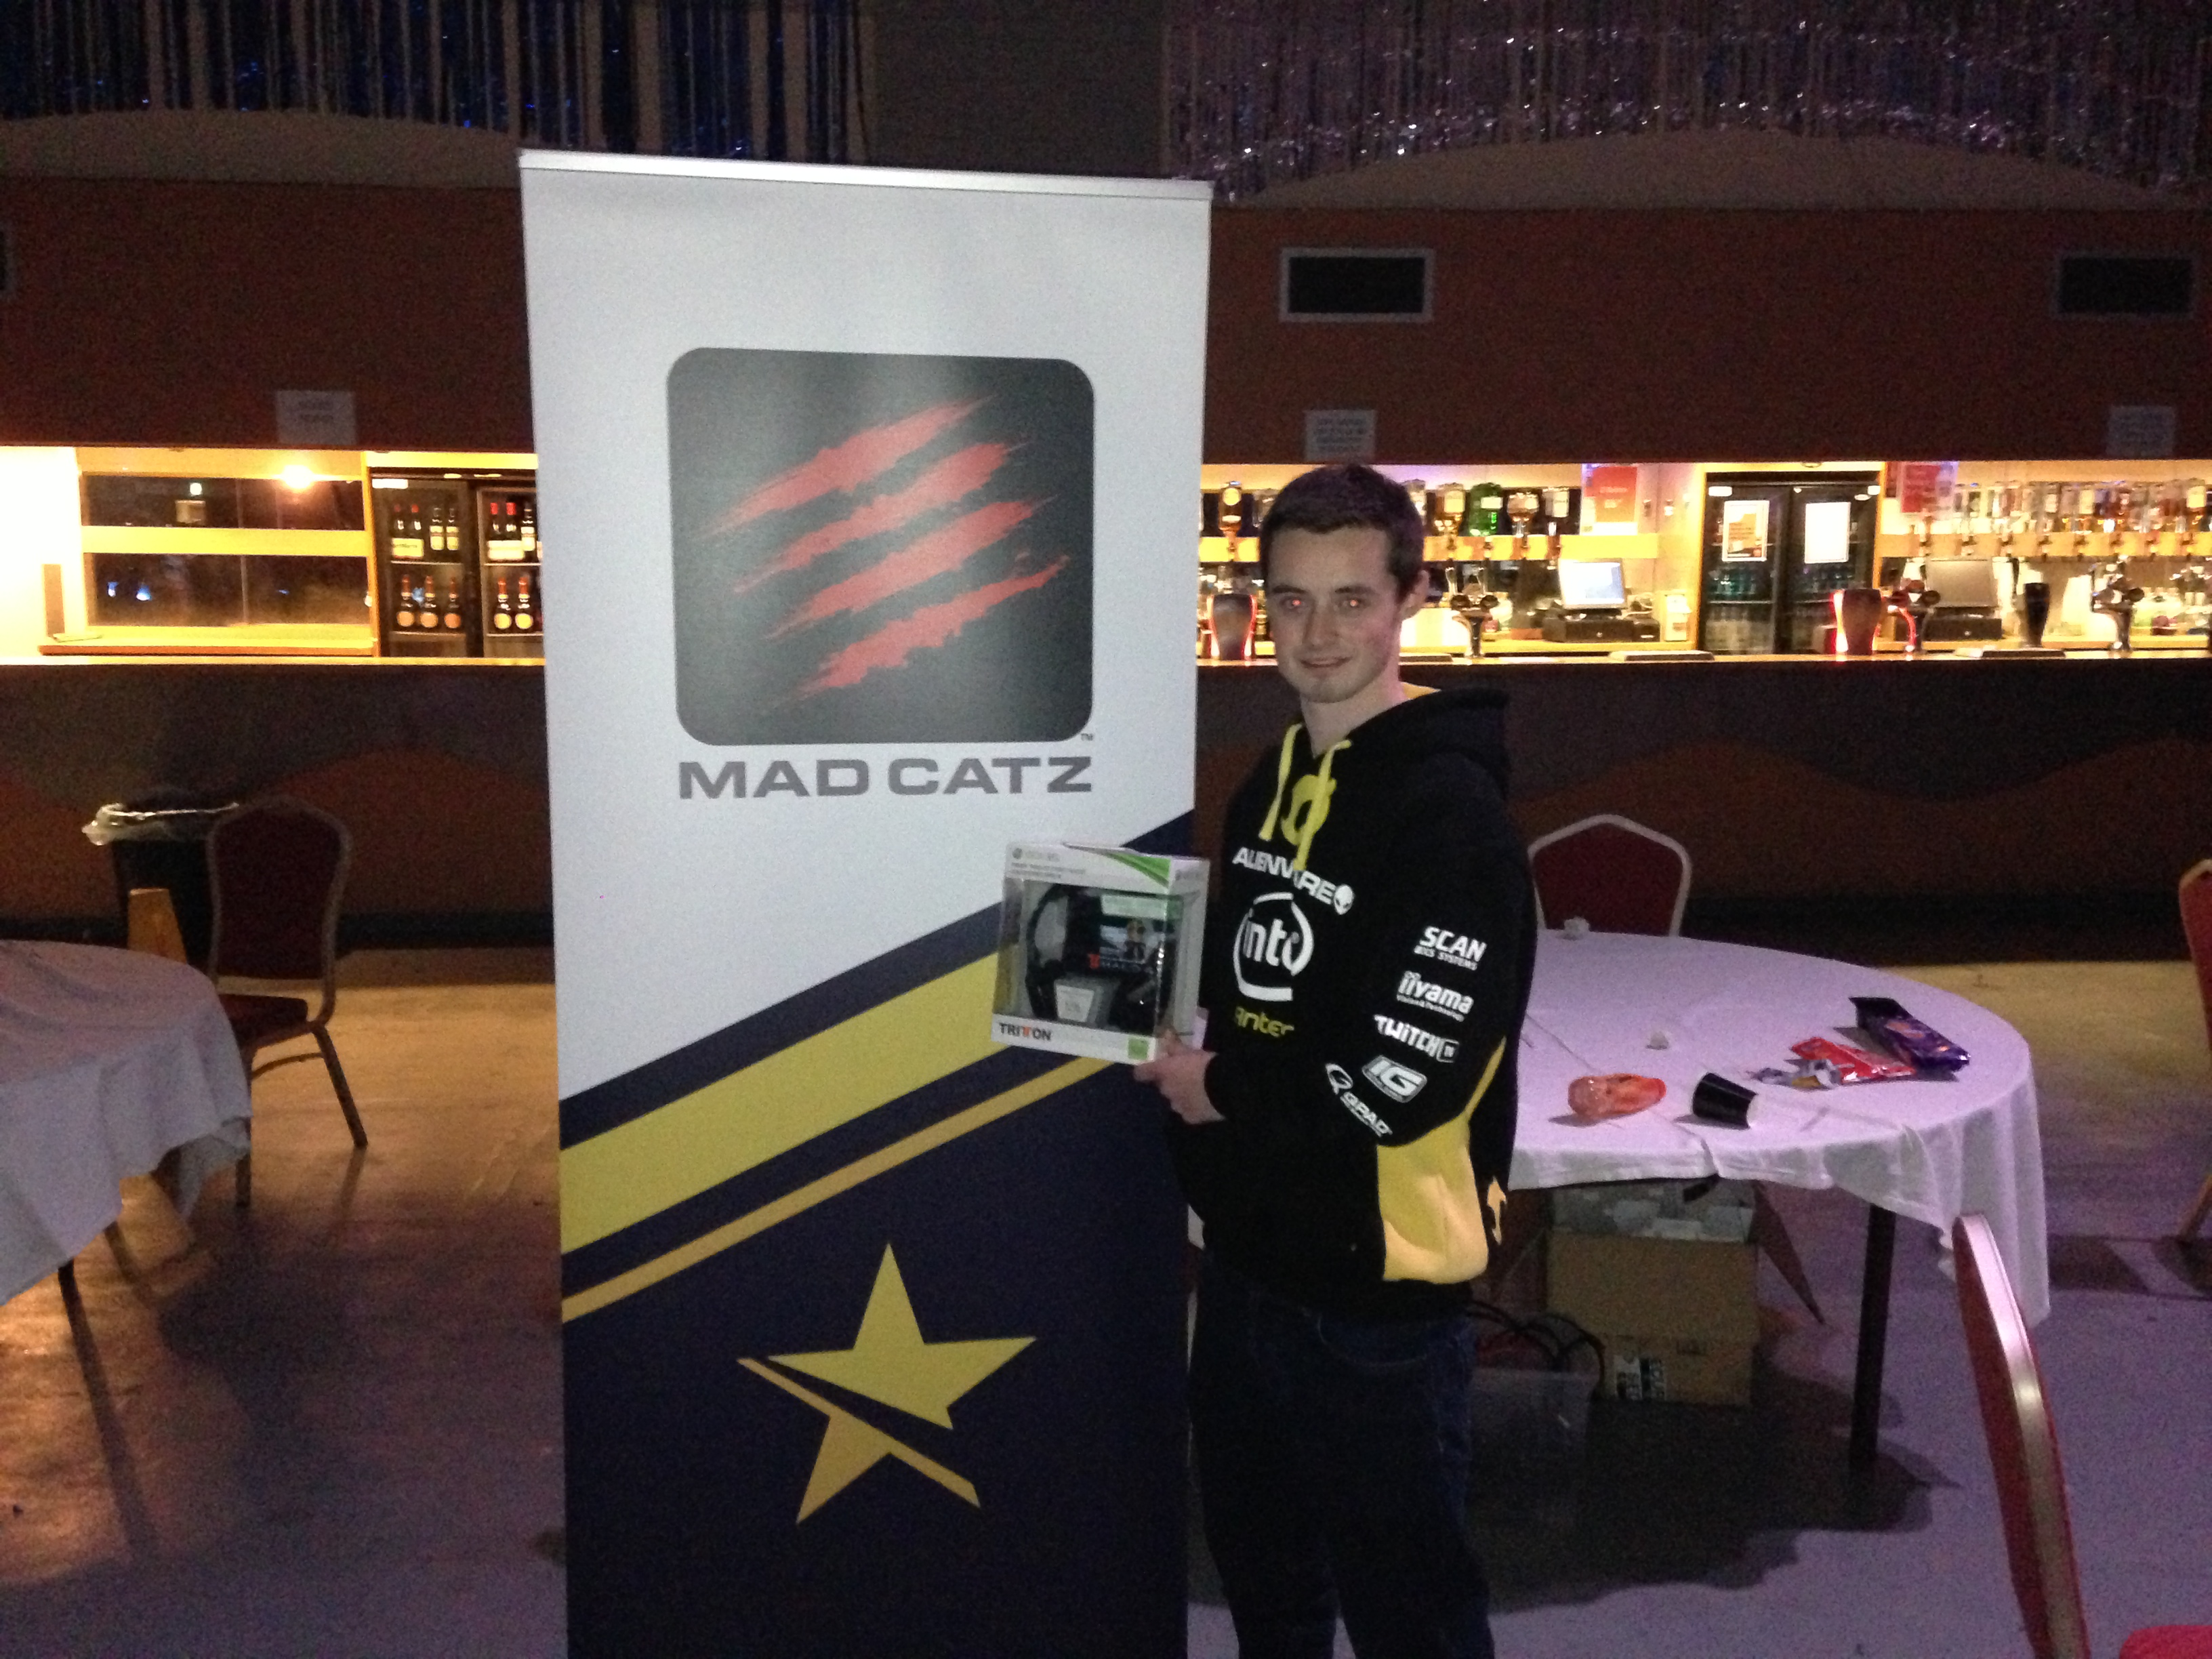 Adam Winster is the Mad Catz FIFA 13 Spring Champion